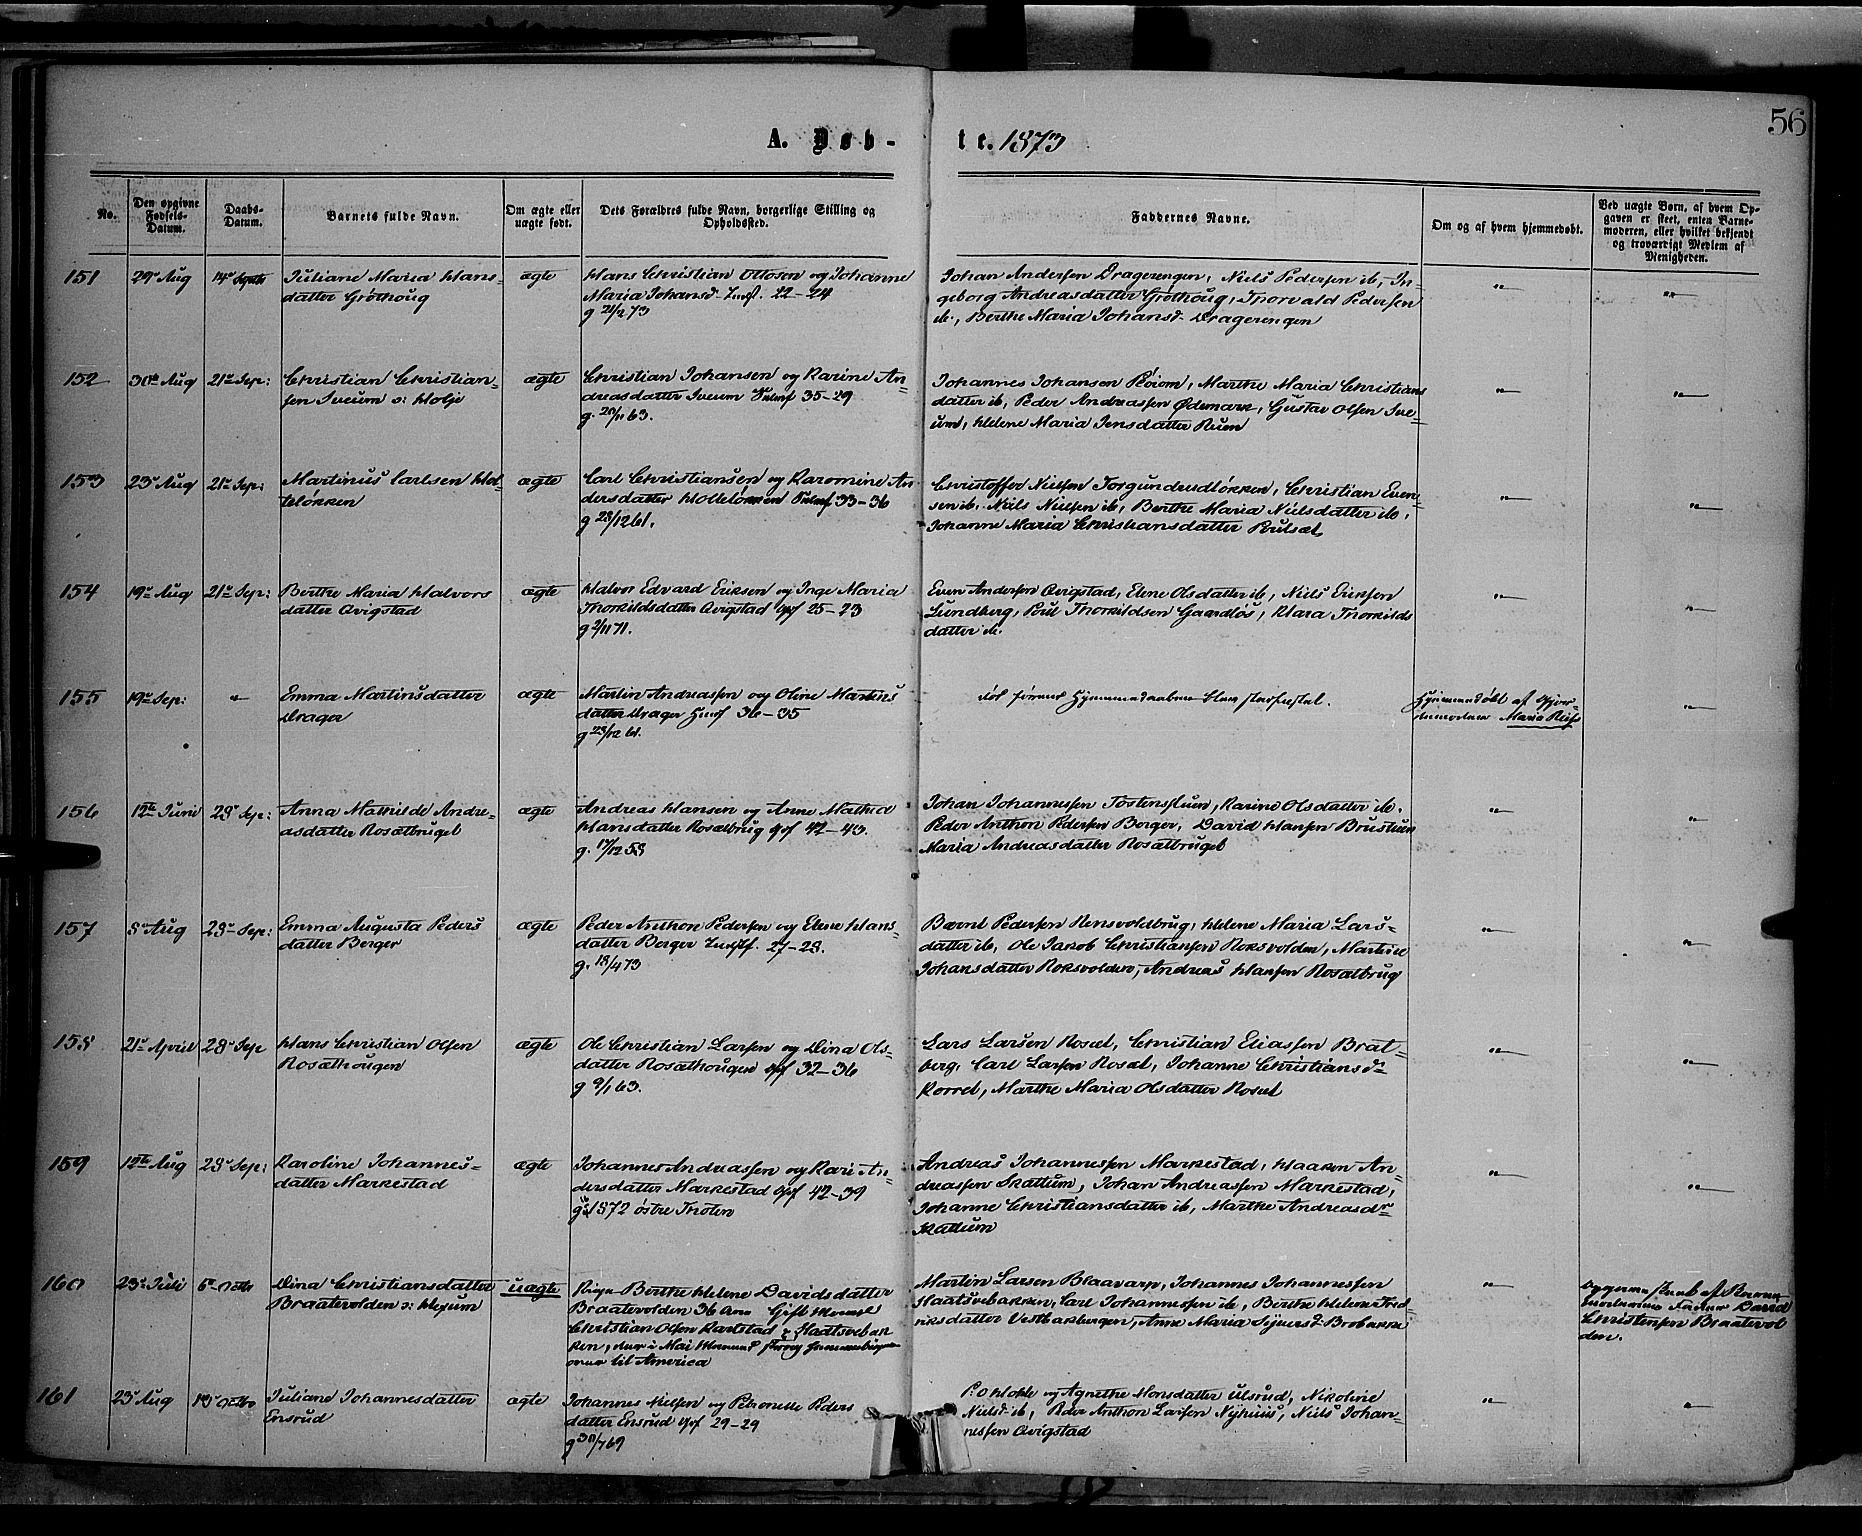 SAH, Vestre Toten prestekontor, H/Ha/Haa/L0008: Ministerialbok nr. 8, 1870-1877, s. 56